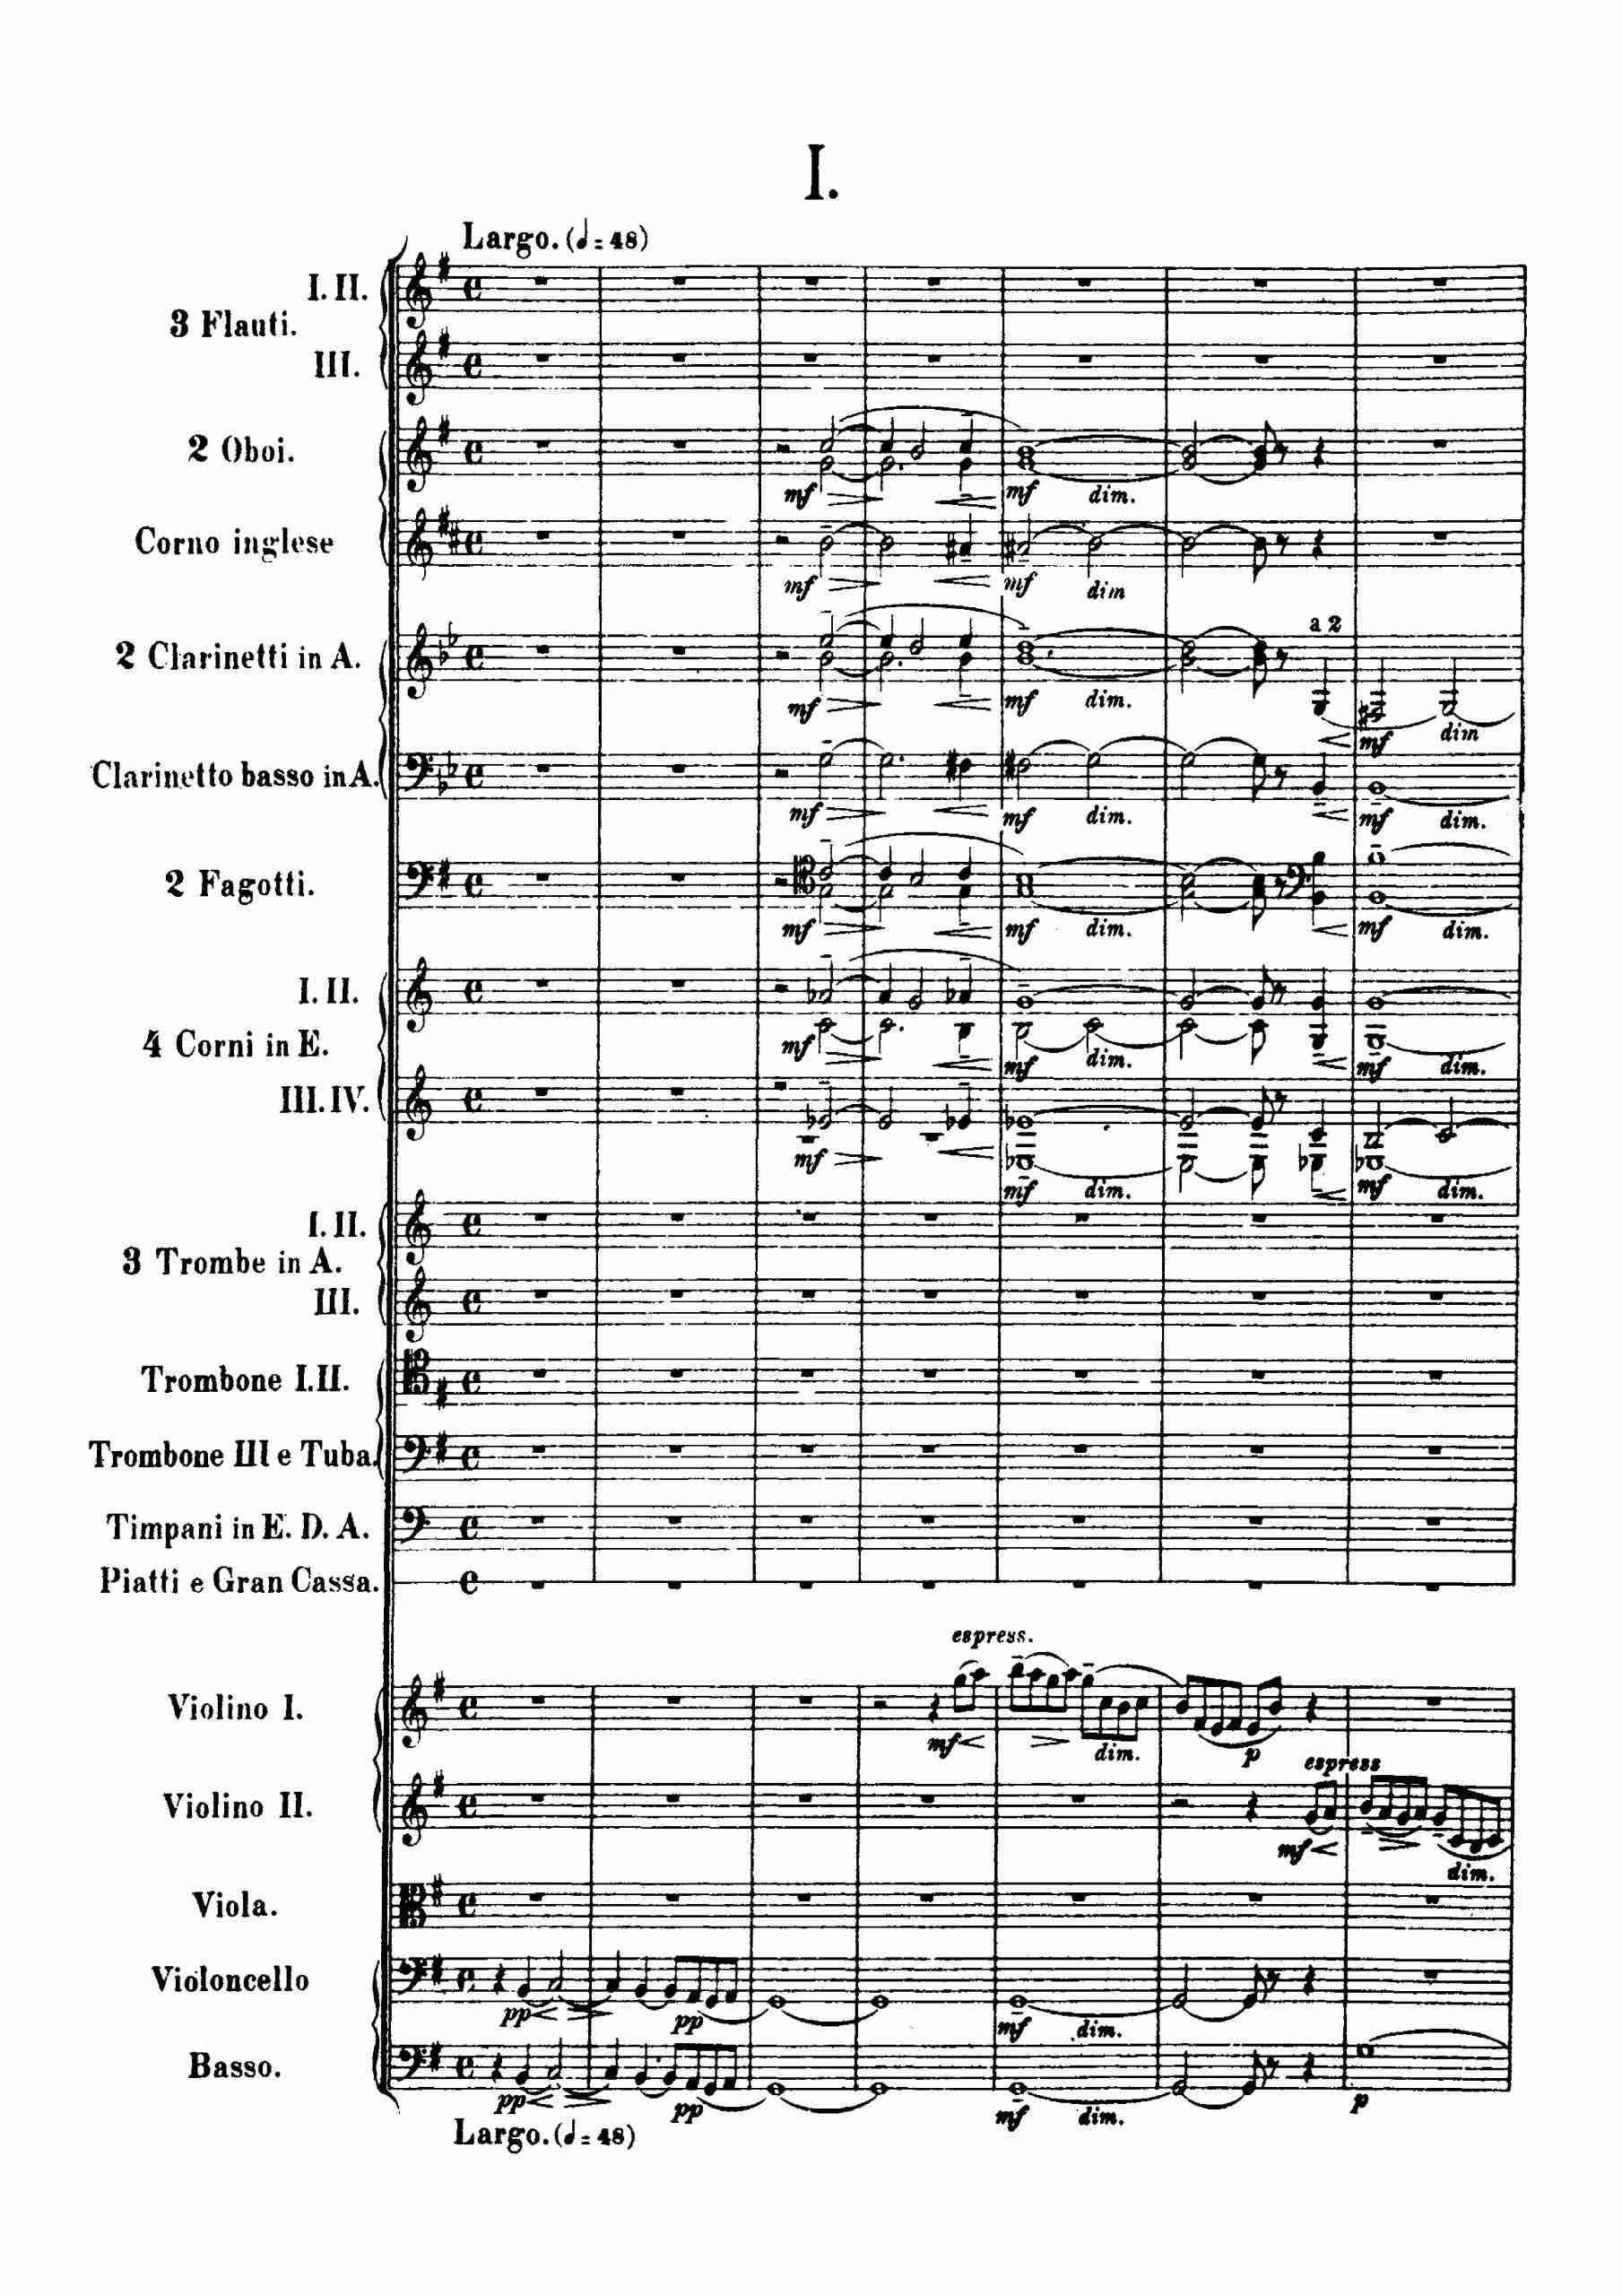 Rachmaninov, Sergei - Symphony No.2, Op.27 movt 1